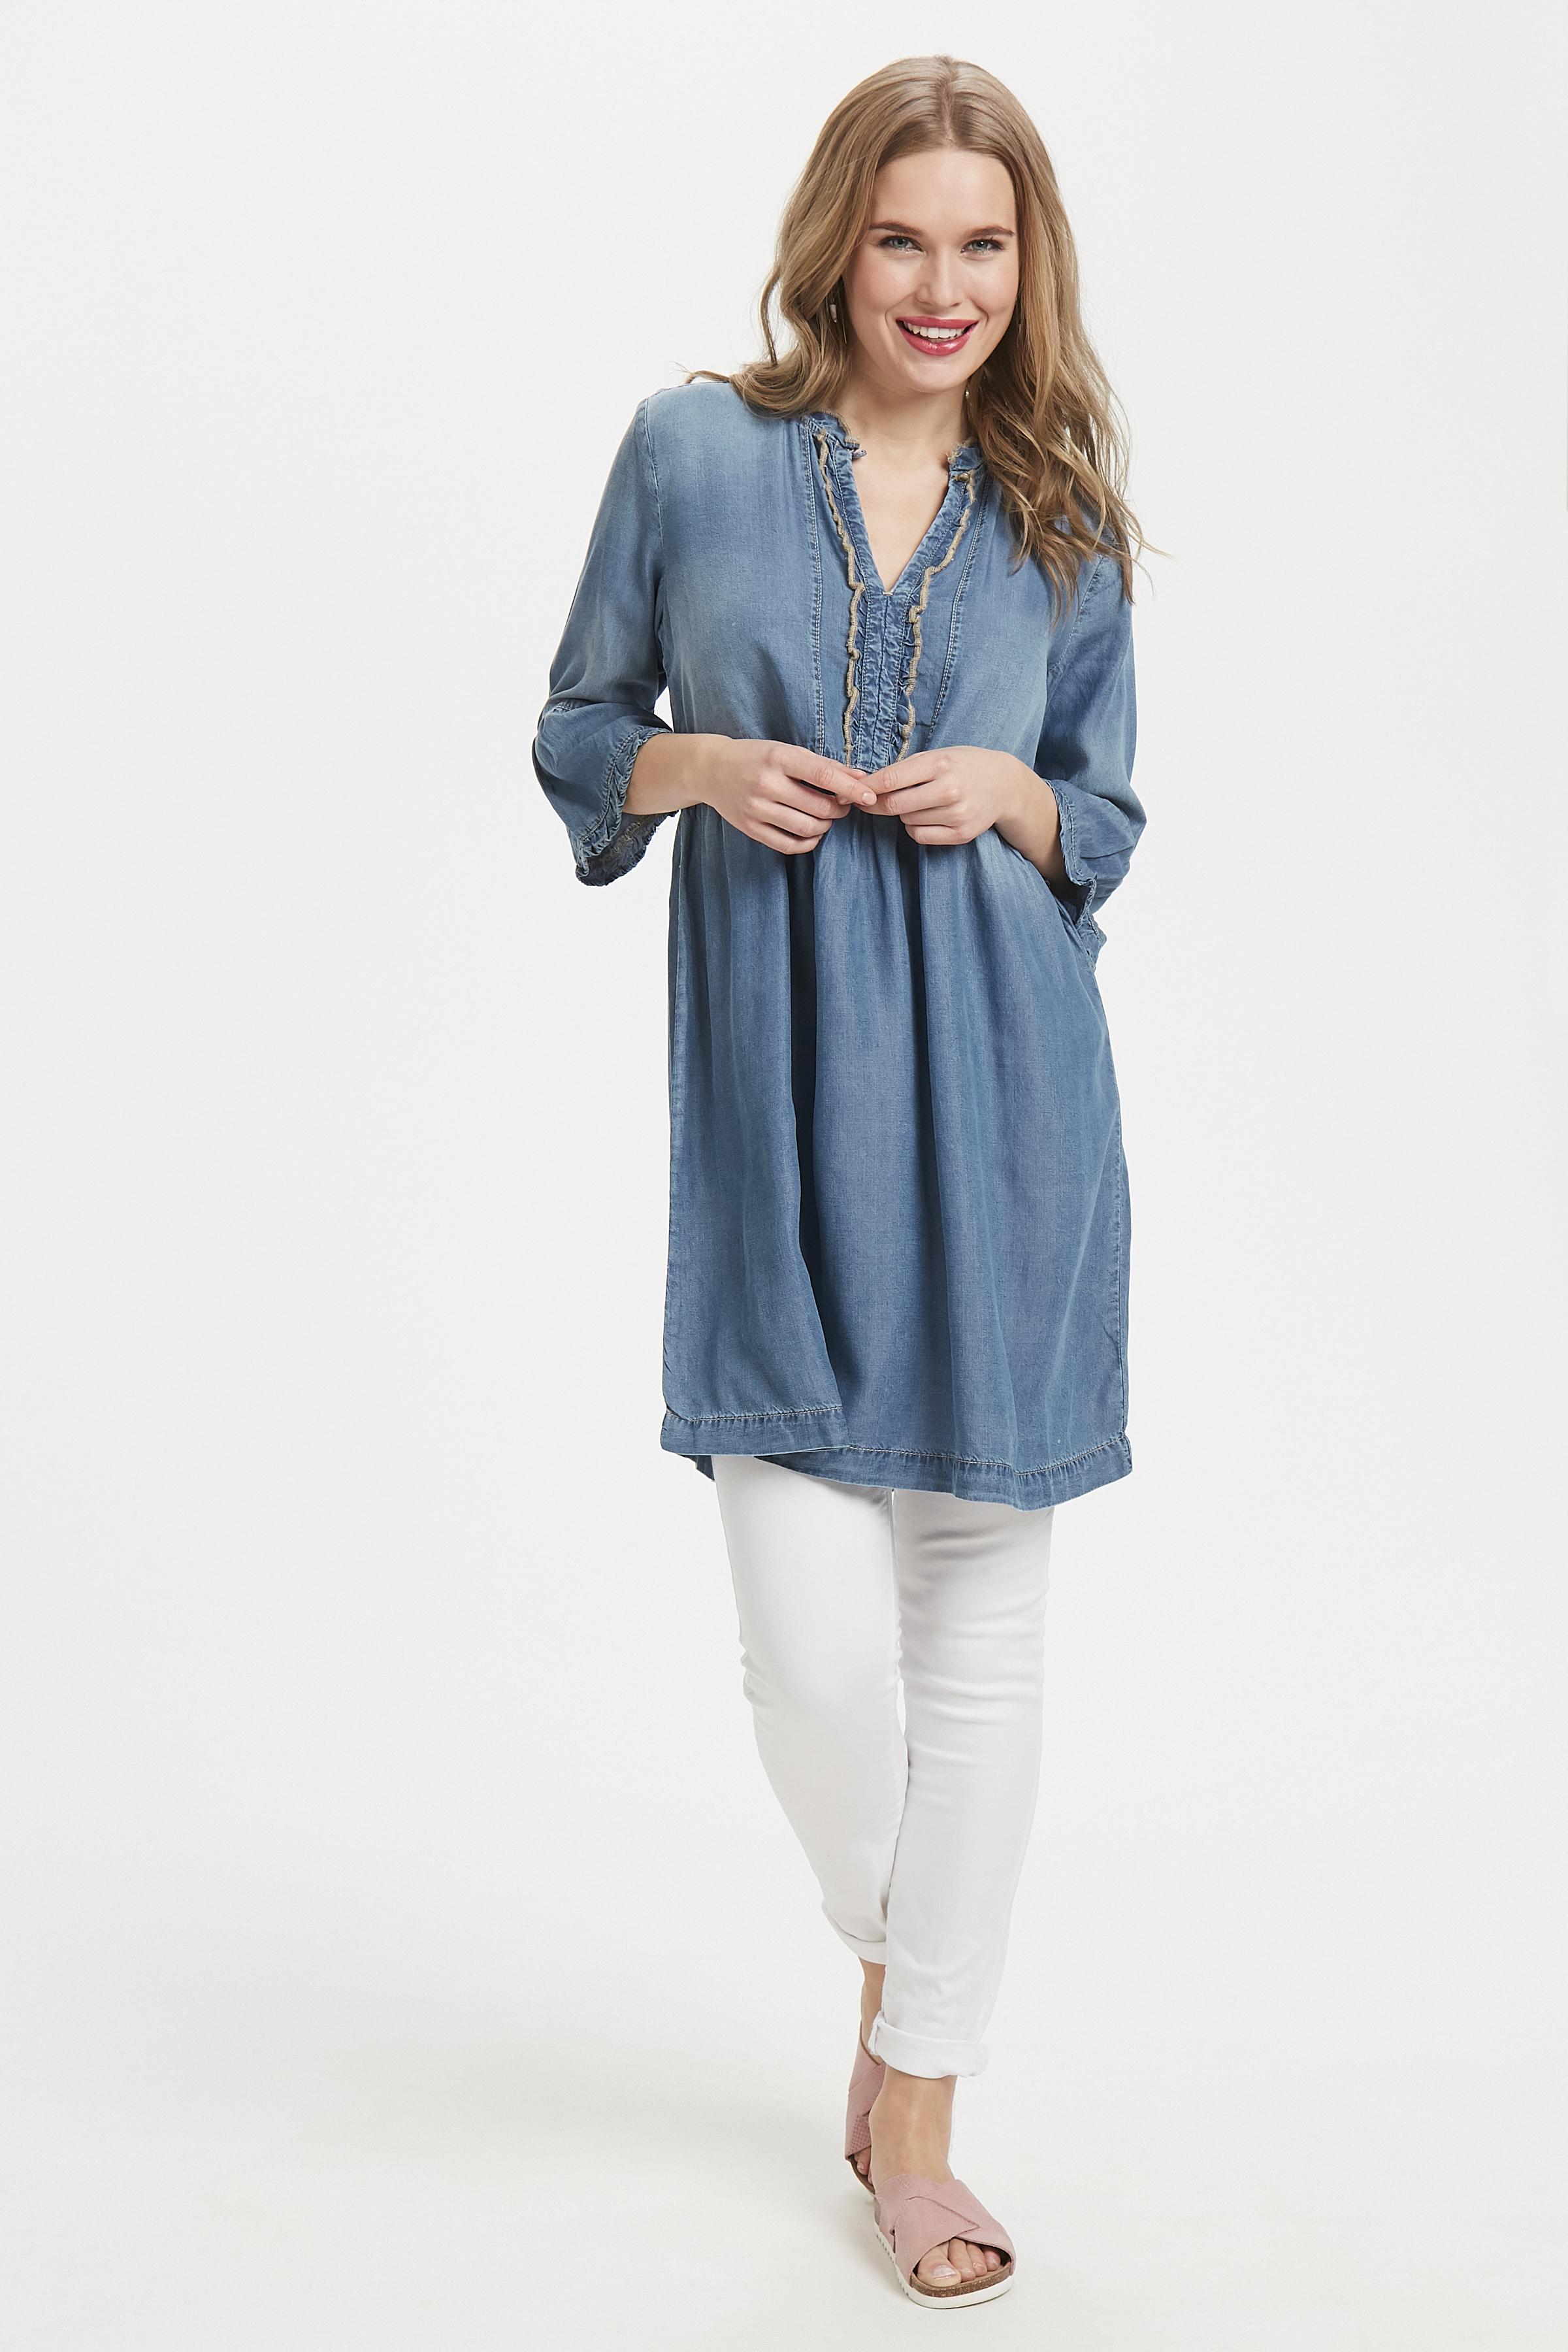 Hell denimblau Denimkleid von Cream – Shoppen Sie Hell denimblau Denimkleid ab Gr. 34-46 hier